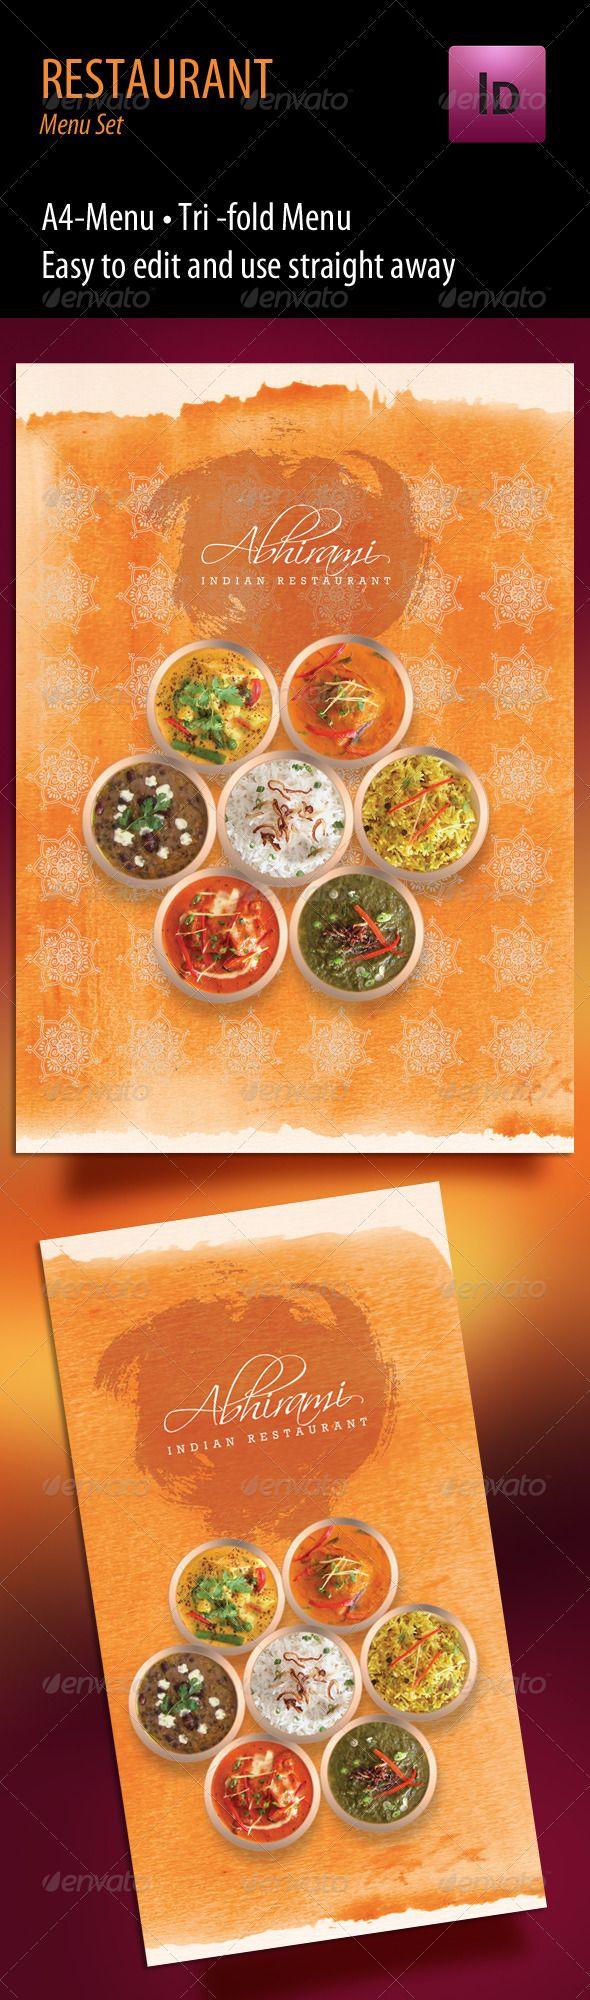 Indian Restaurant Menu set - A4 & Trifold | Menus restaurantes ...